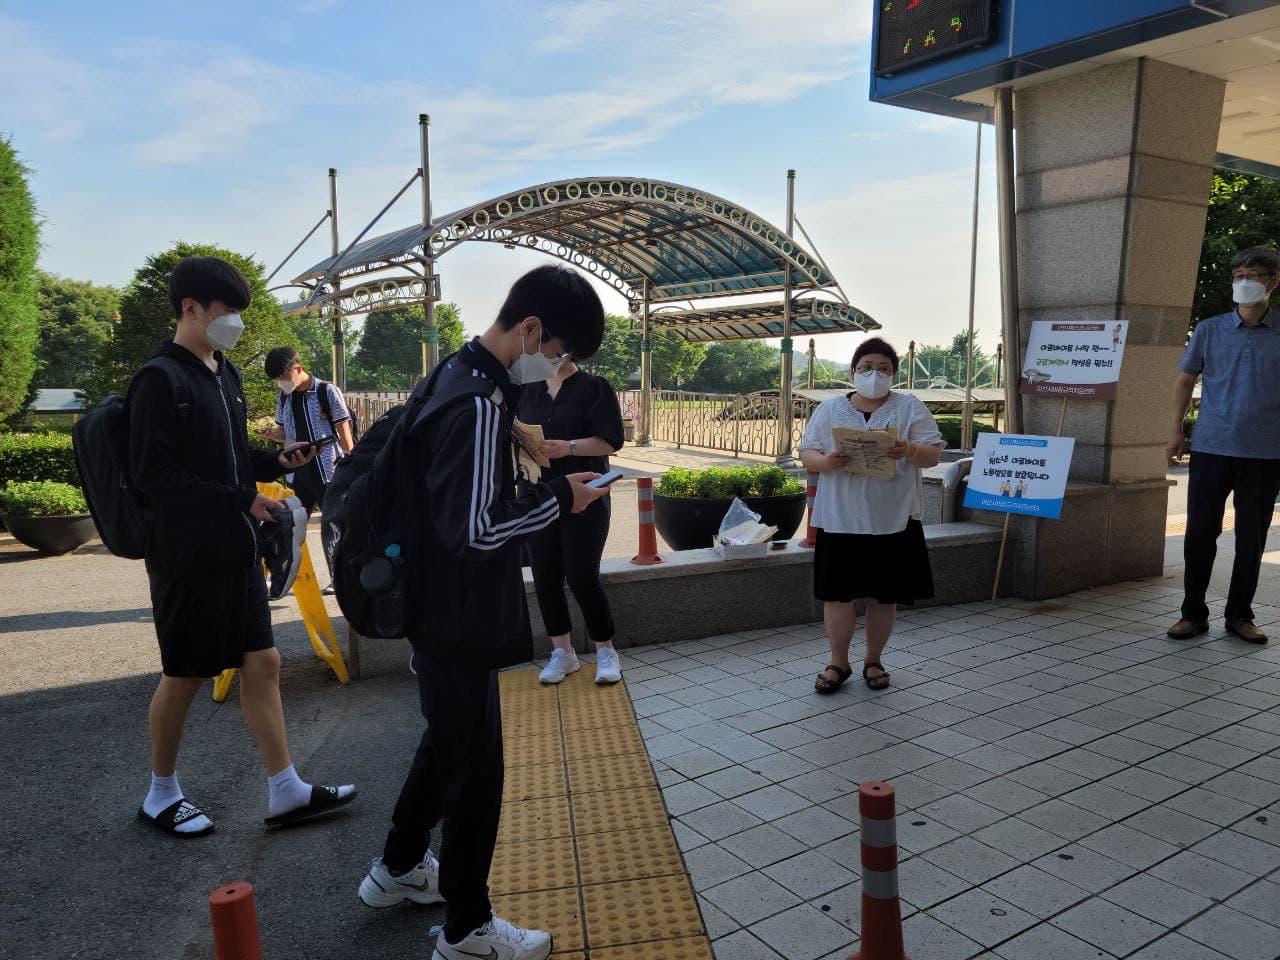 photo_2021-07-13_08-50-59.jpg